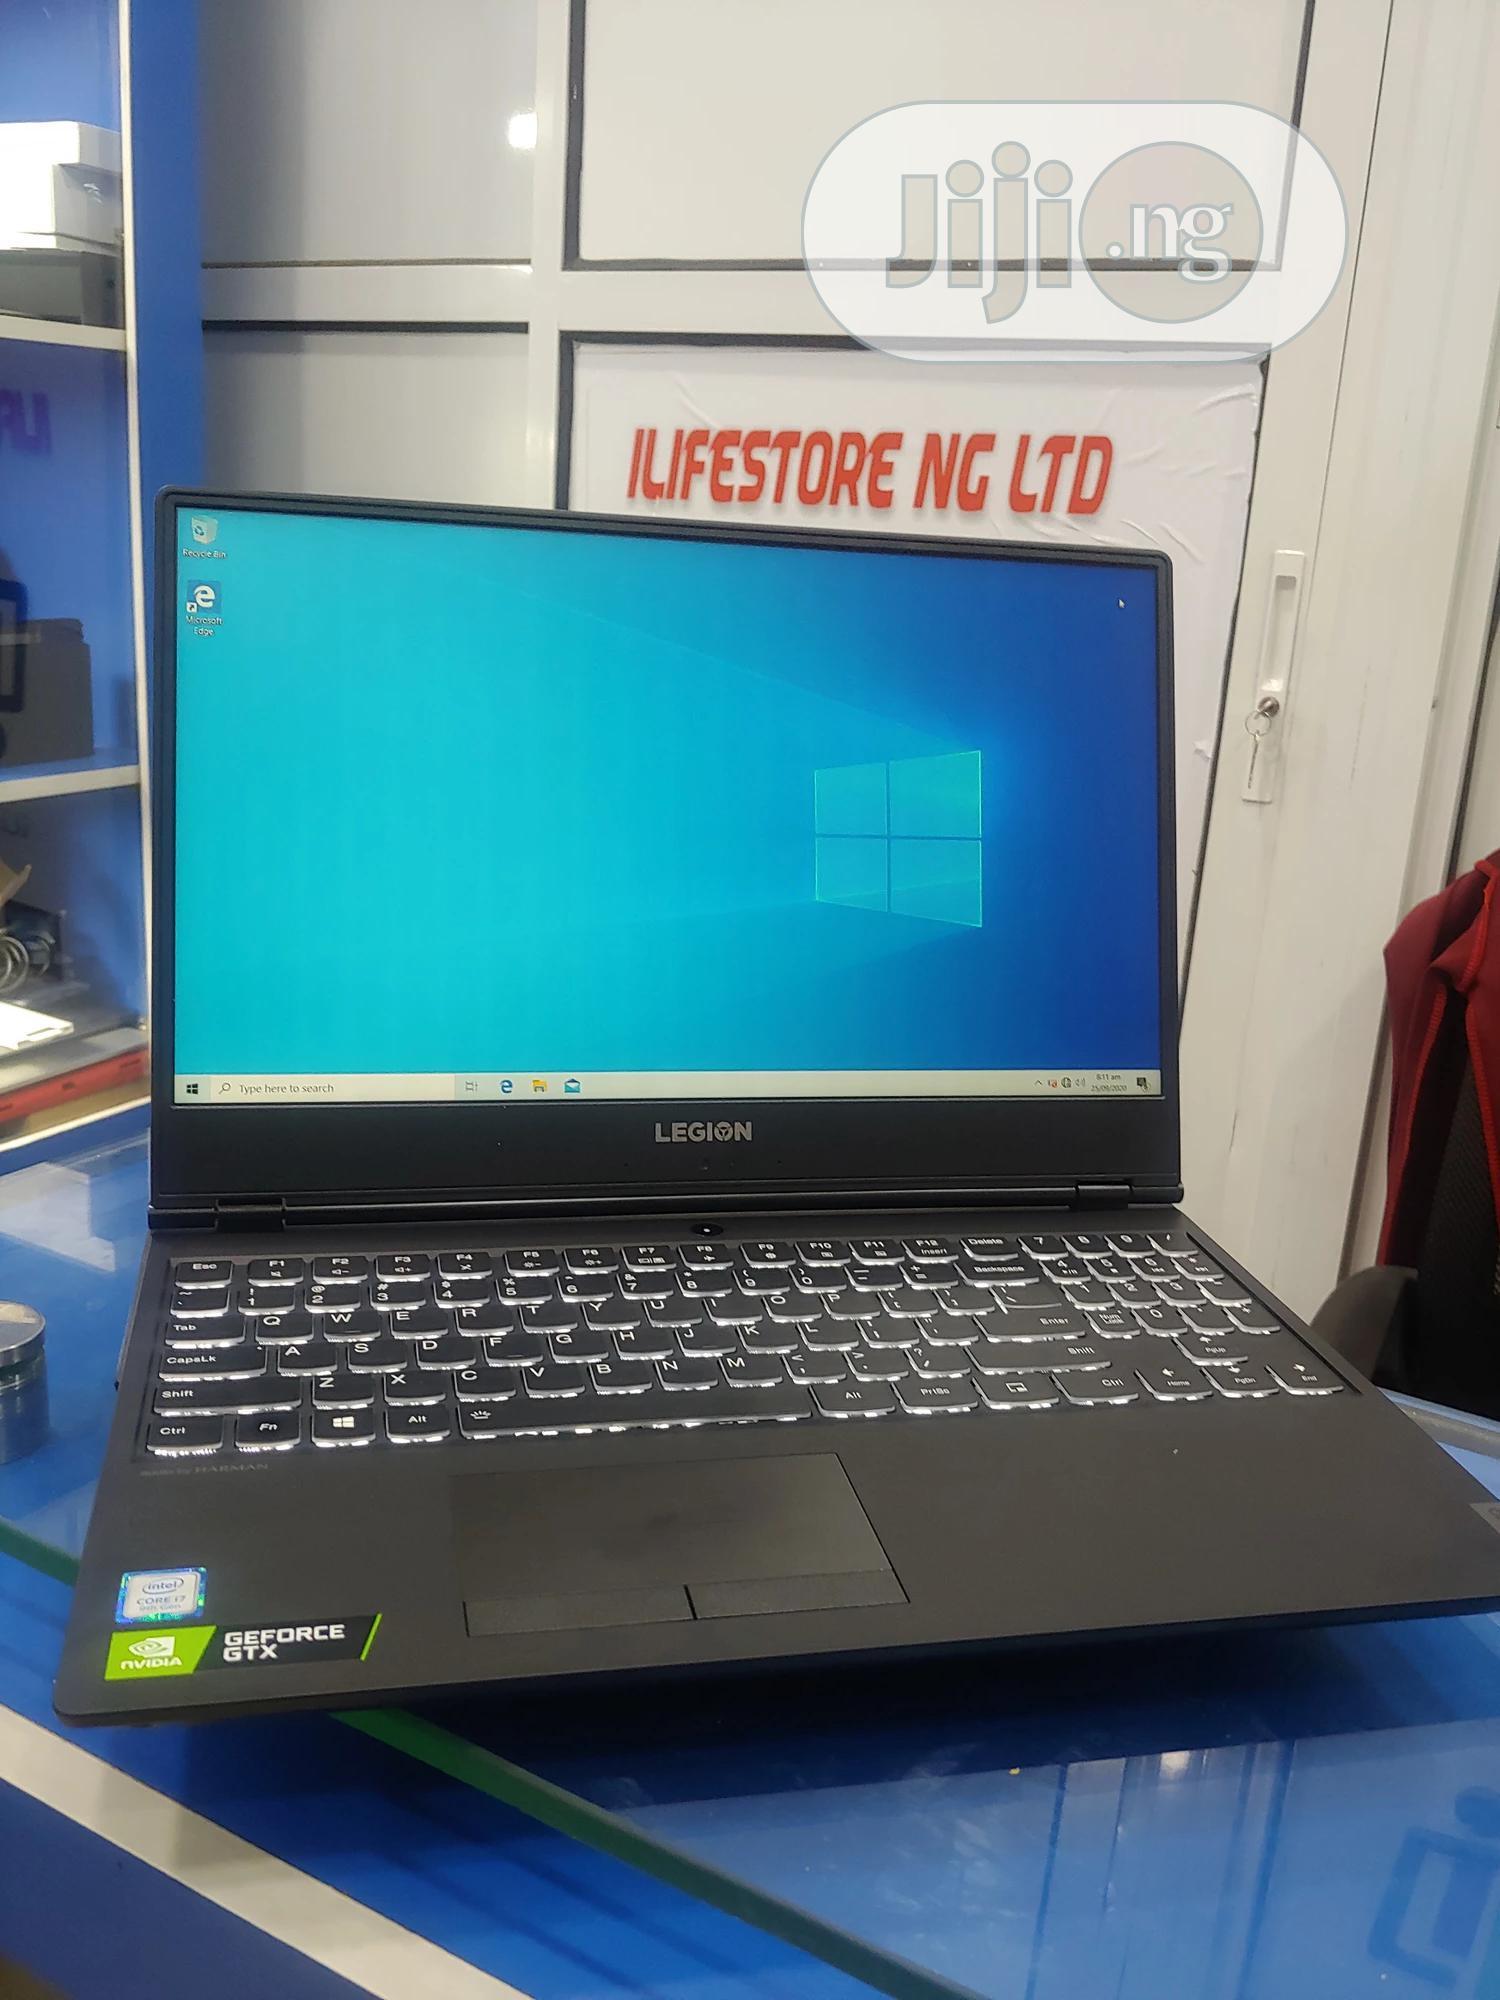 Laptop Lenovo Legion Y540 16GB Intel Core i7 SSHD (Hybrid) 1T | Laptops & Computers for sale in Ikeja, Lagos State, Nigeria